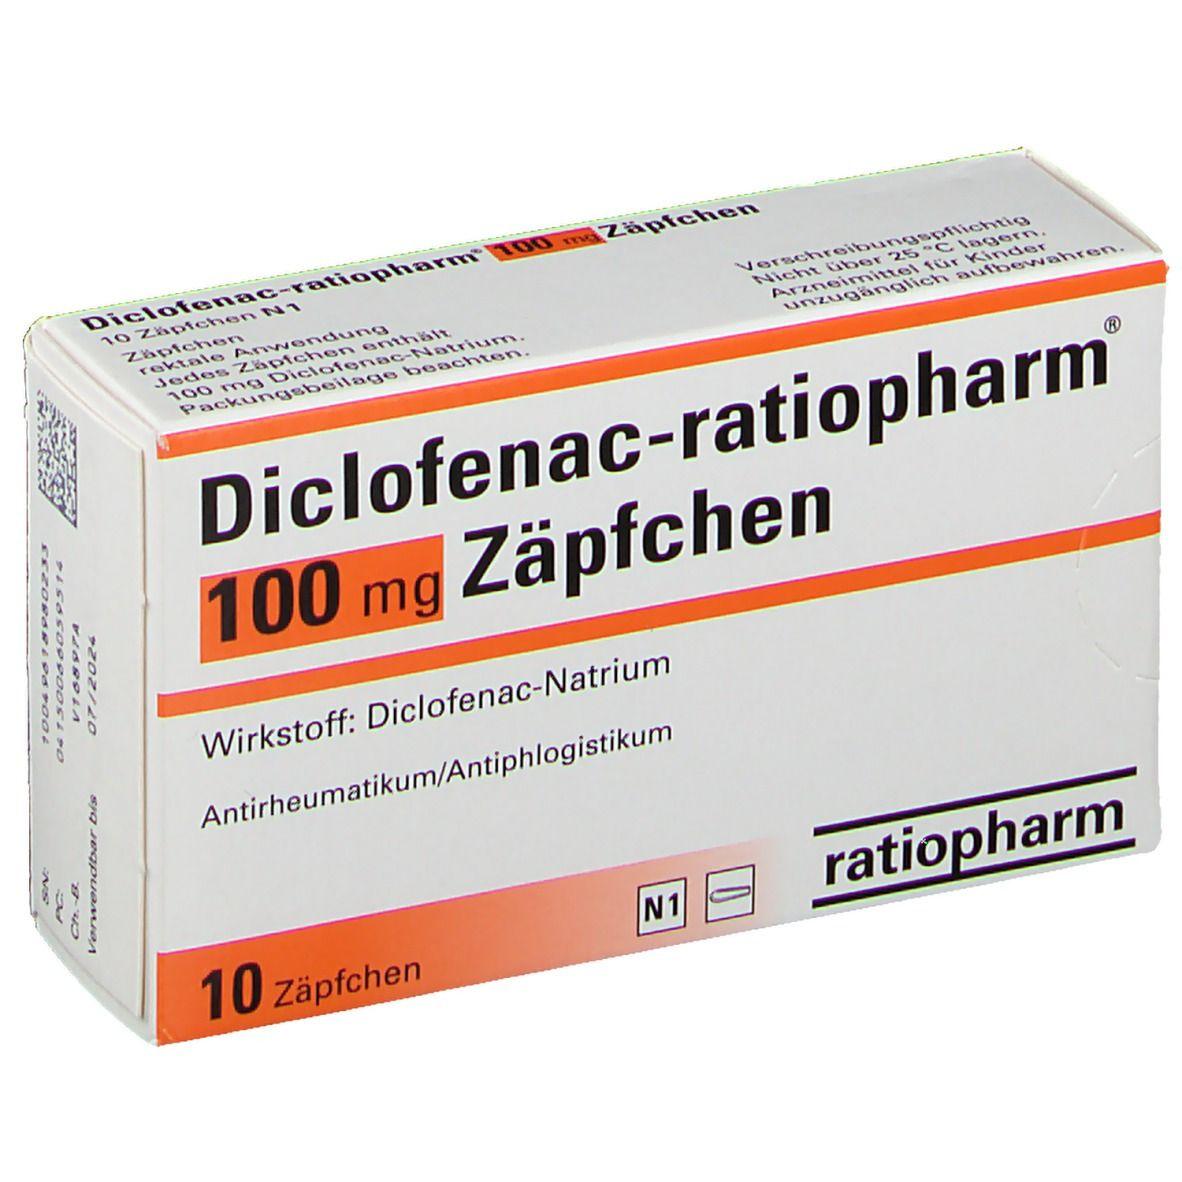 Diclofenac Ratiopharm 100 Mg Zapfchen 10 St Shop Apotheke Com